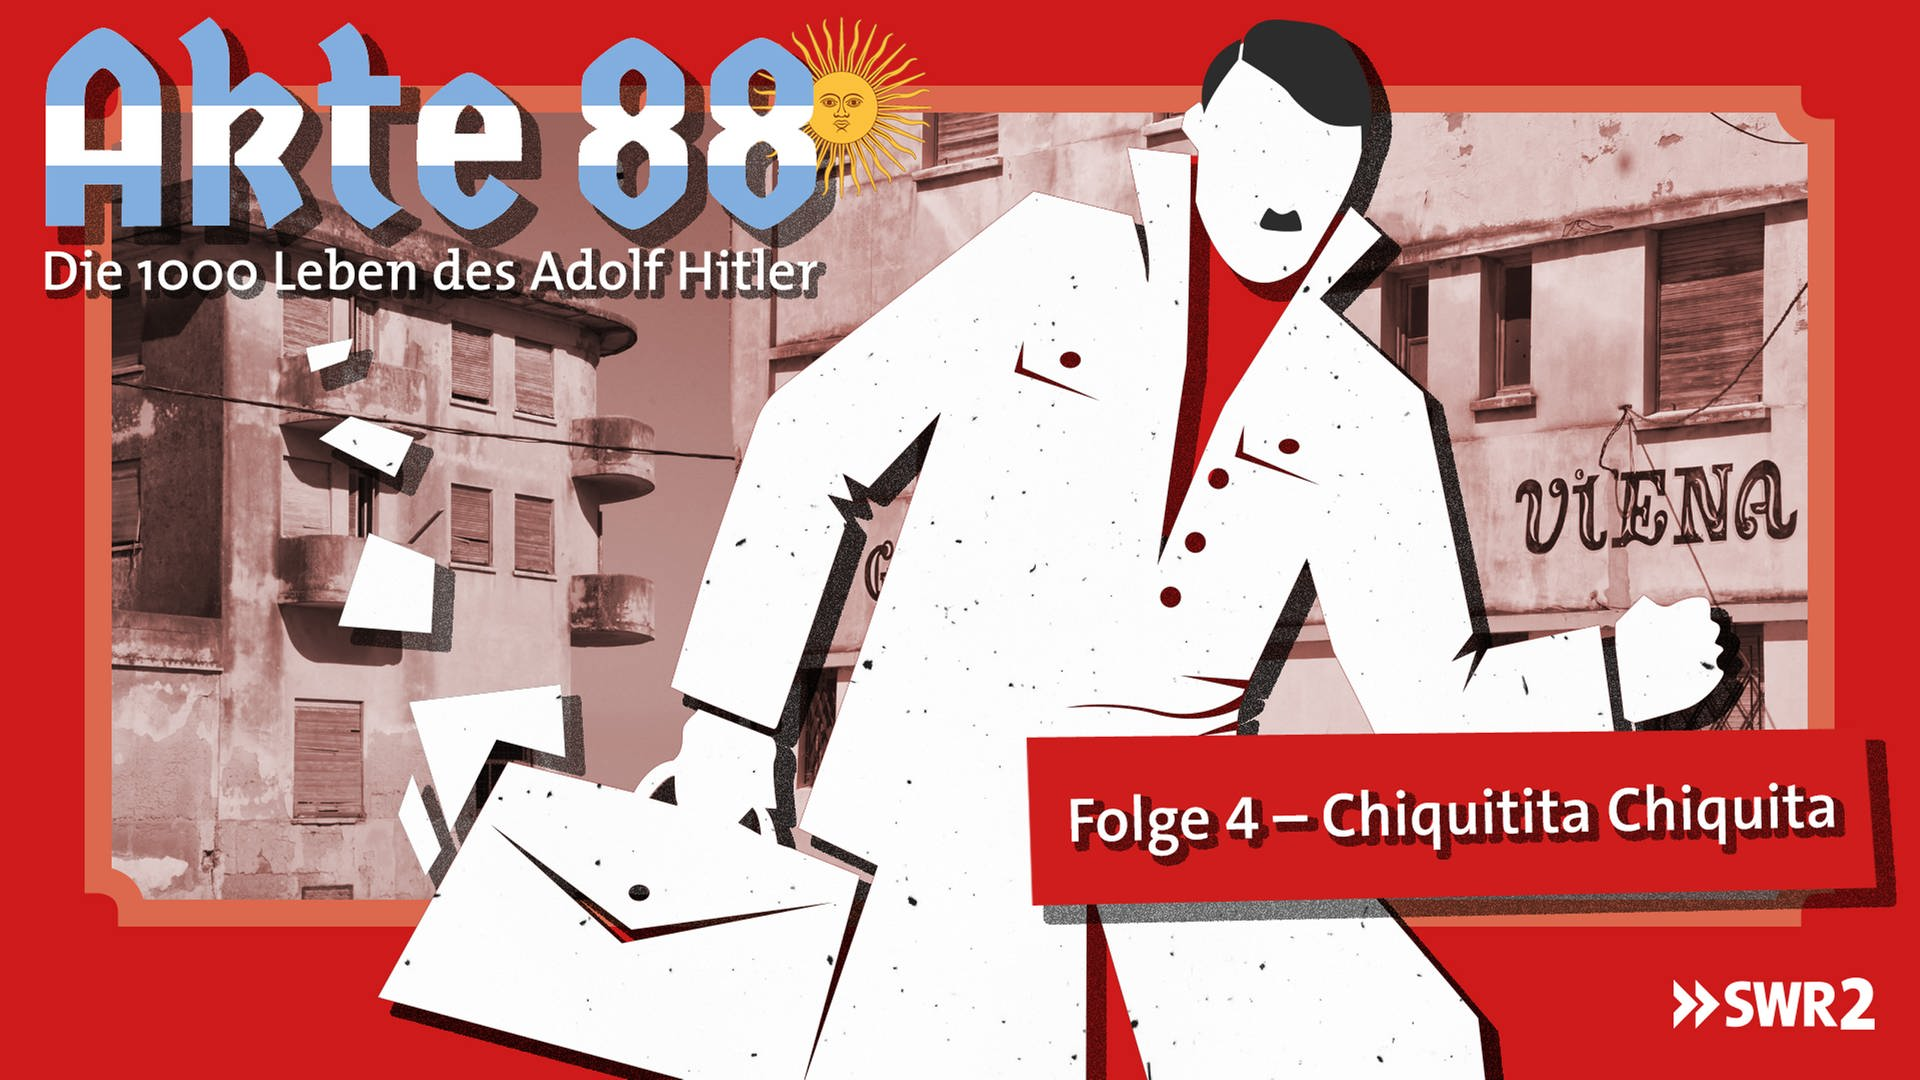 Chiquitita Chiquita - Folge 4 | Hörspiel | SWR2 | SWR